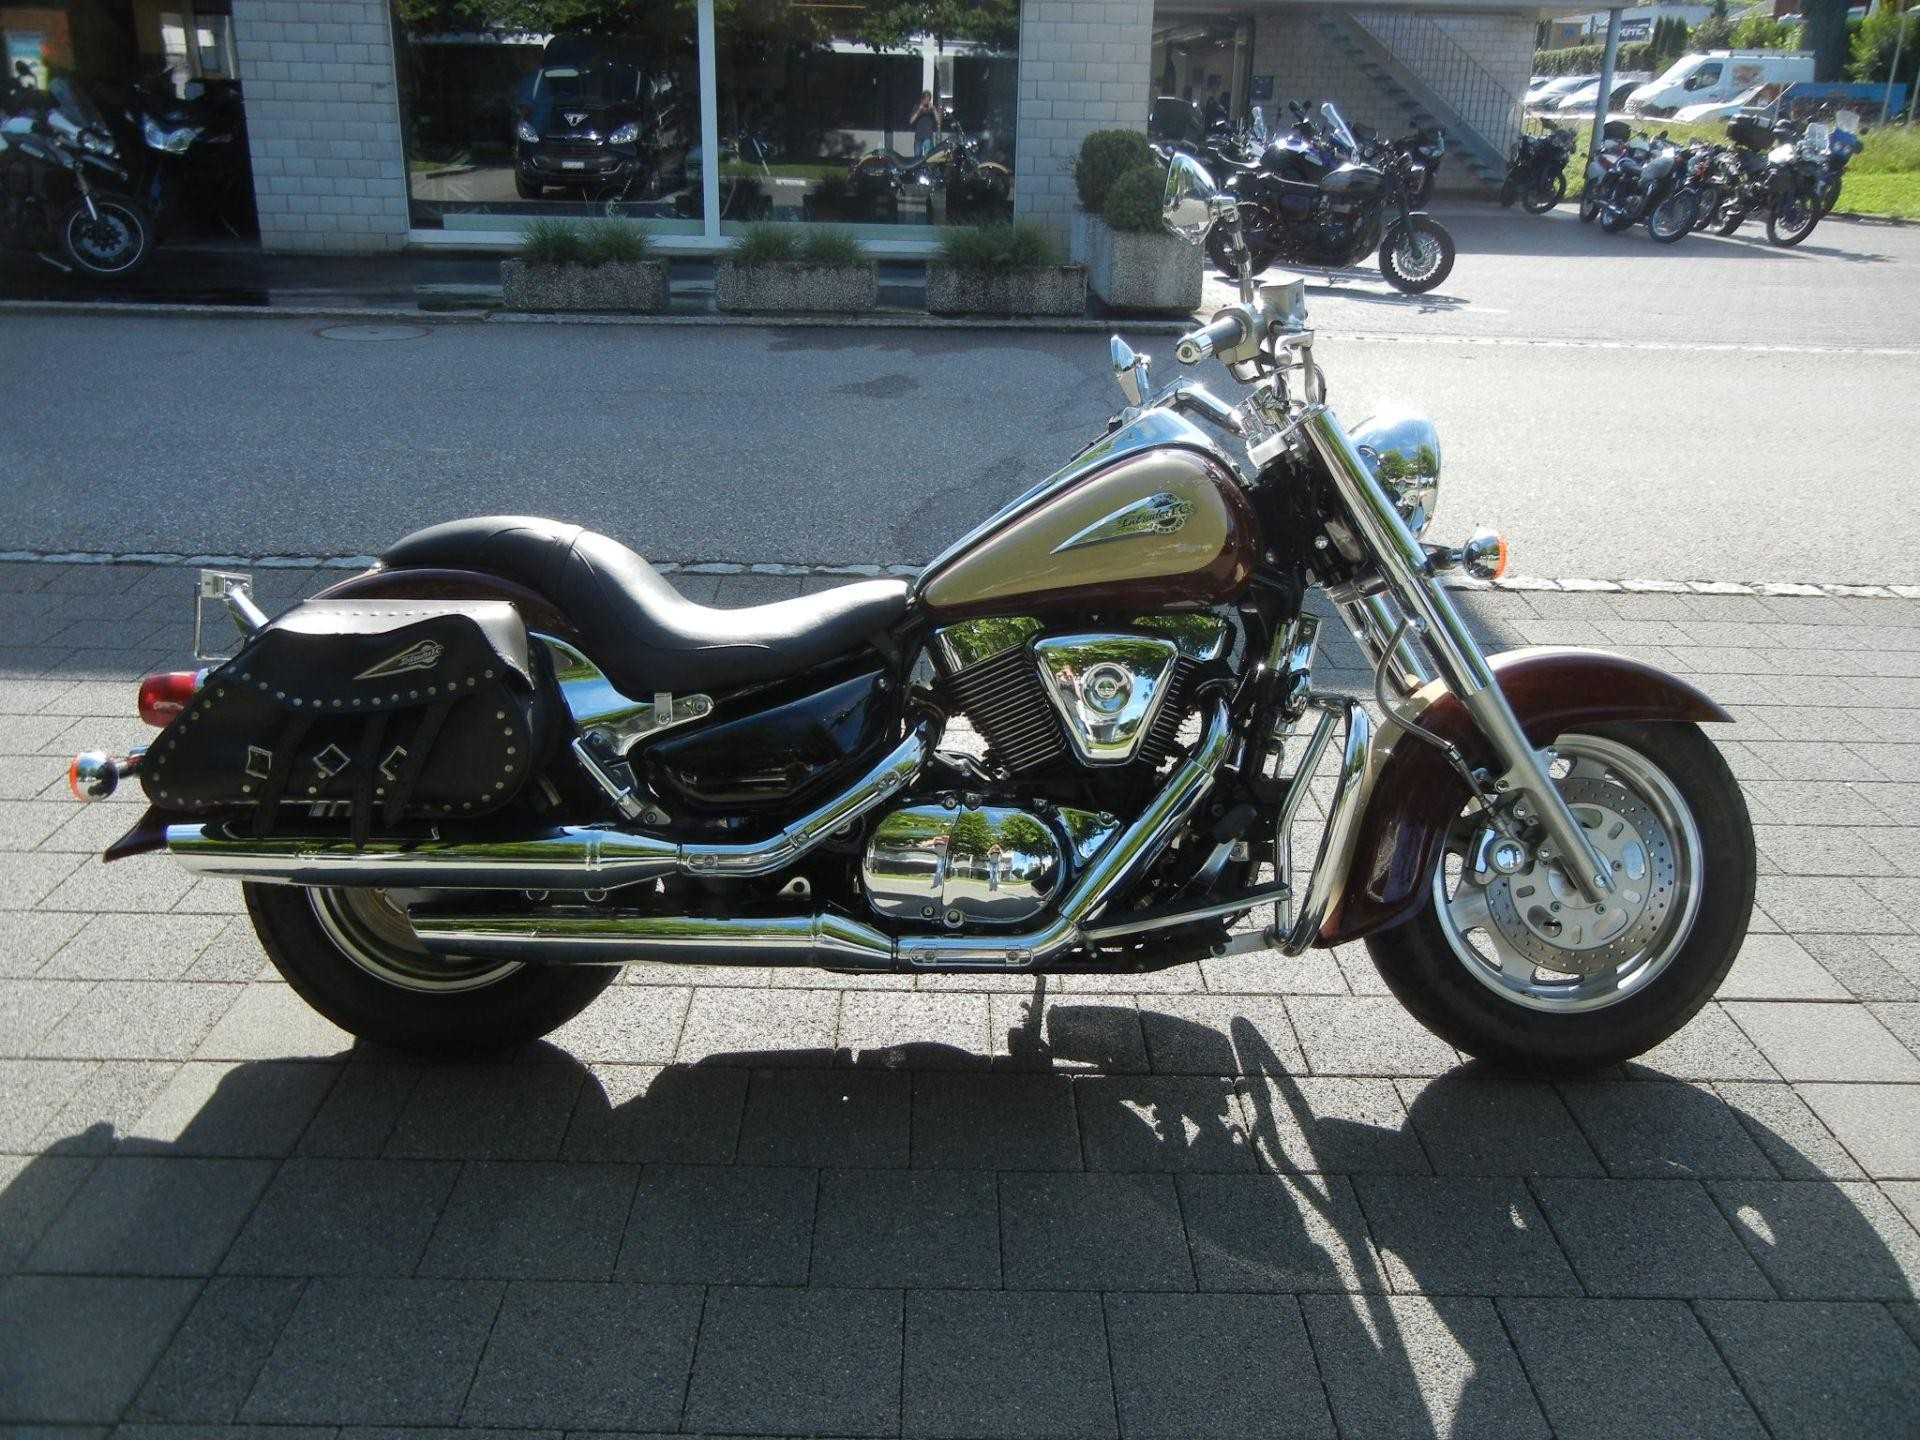 moto occasions acheter suzuki vl 1500 intruder iff motorcycles ag gettnau. Black Bedroom Furniture Sets. Home Design Ideas